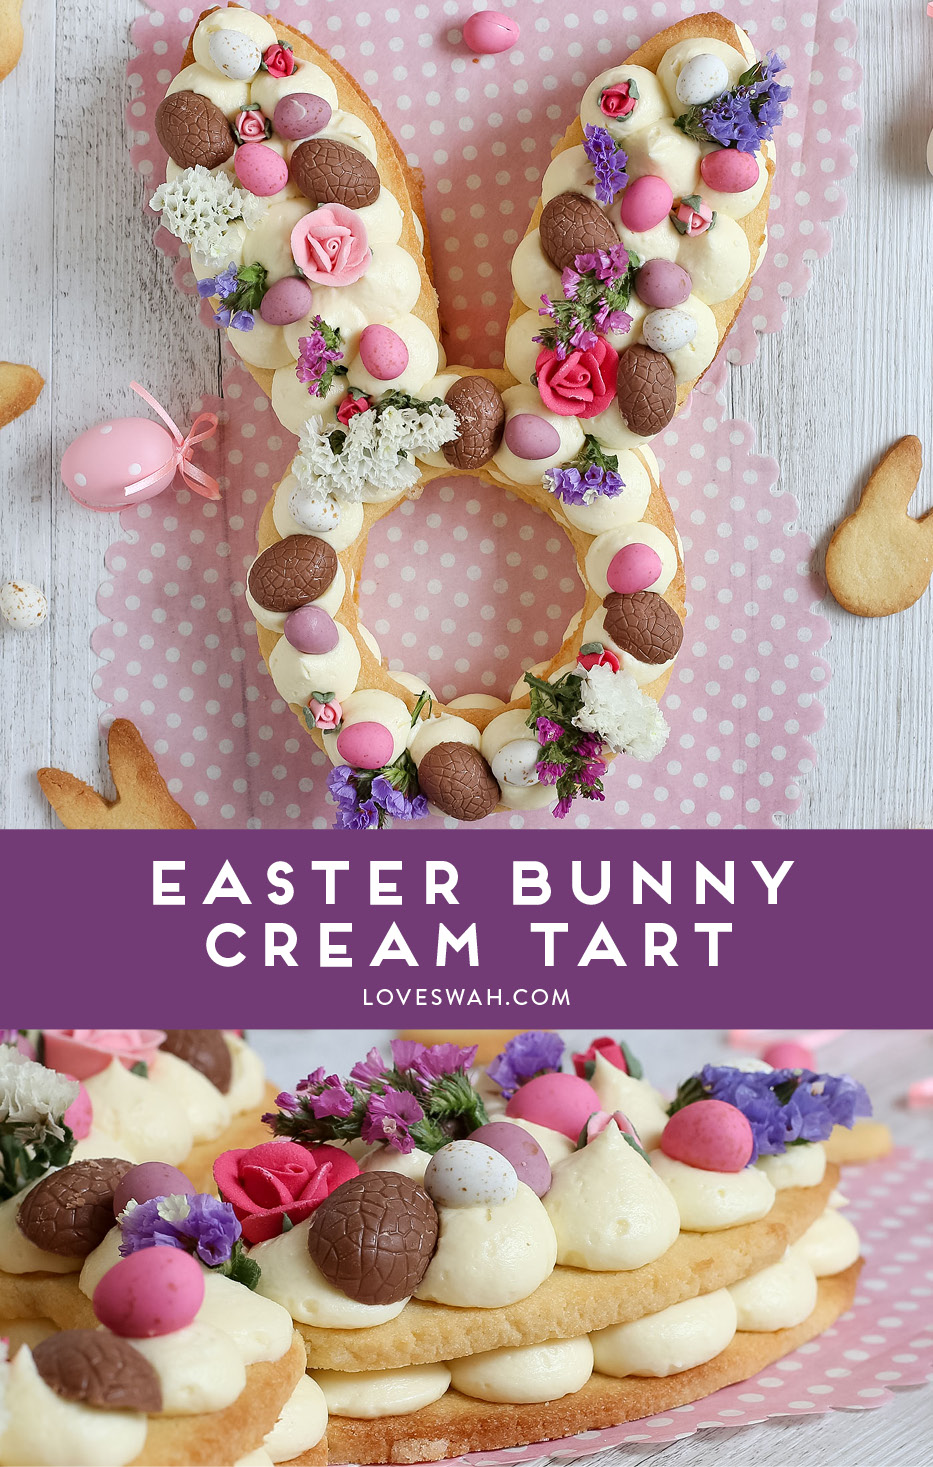 Easter Bunny Cream Tart Love Swah